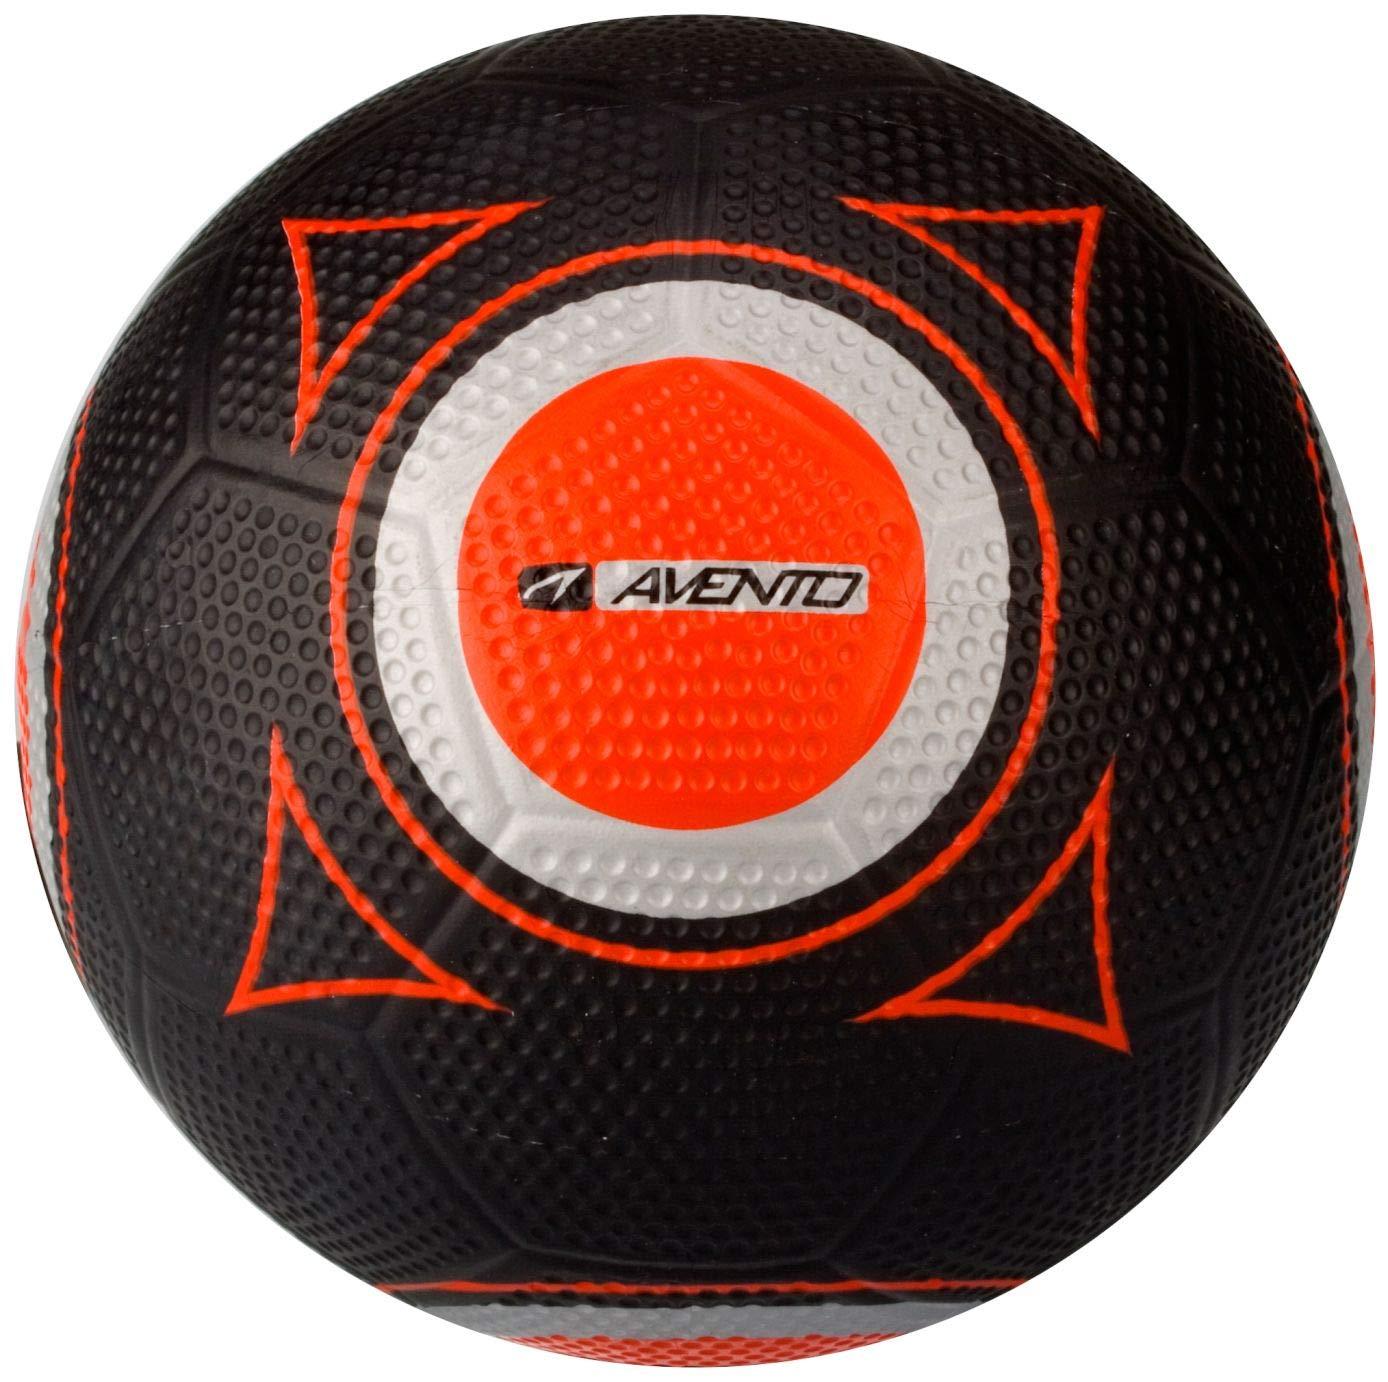 Street fútbol Schreuders Schreuders Sport_16SP-ZRG-5